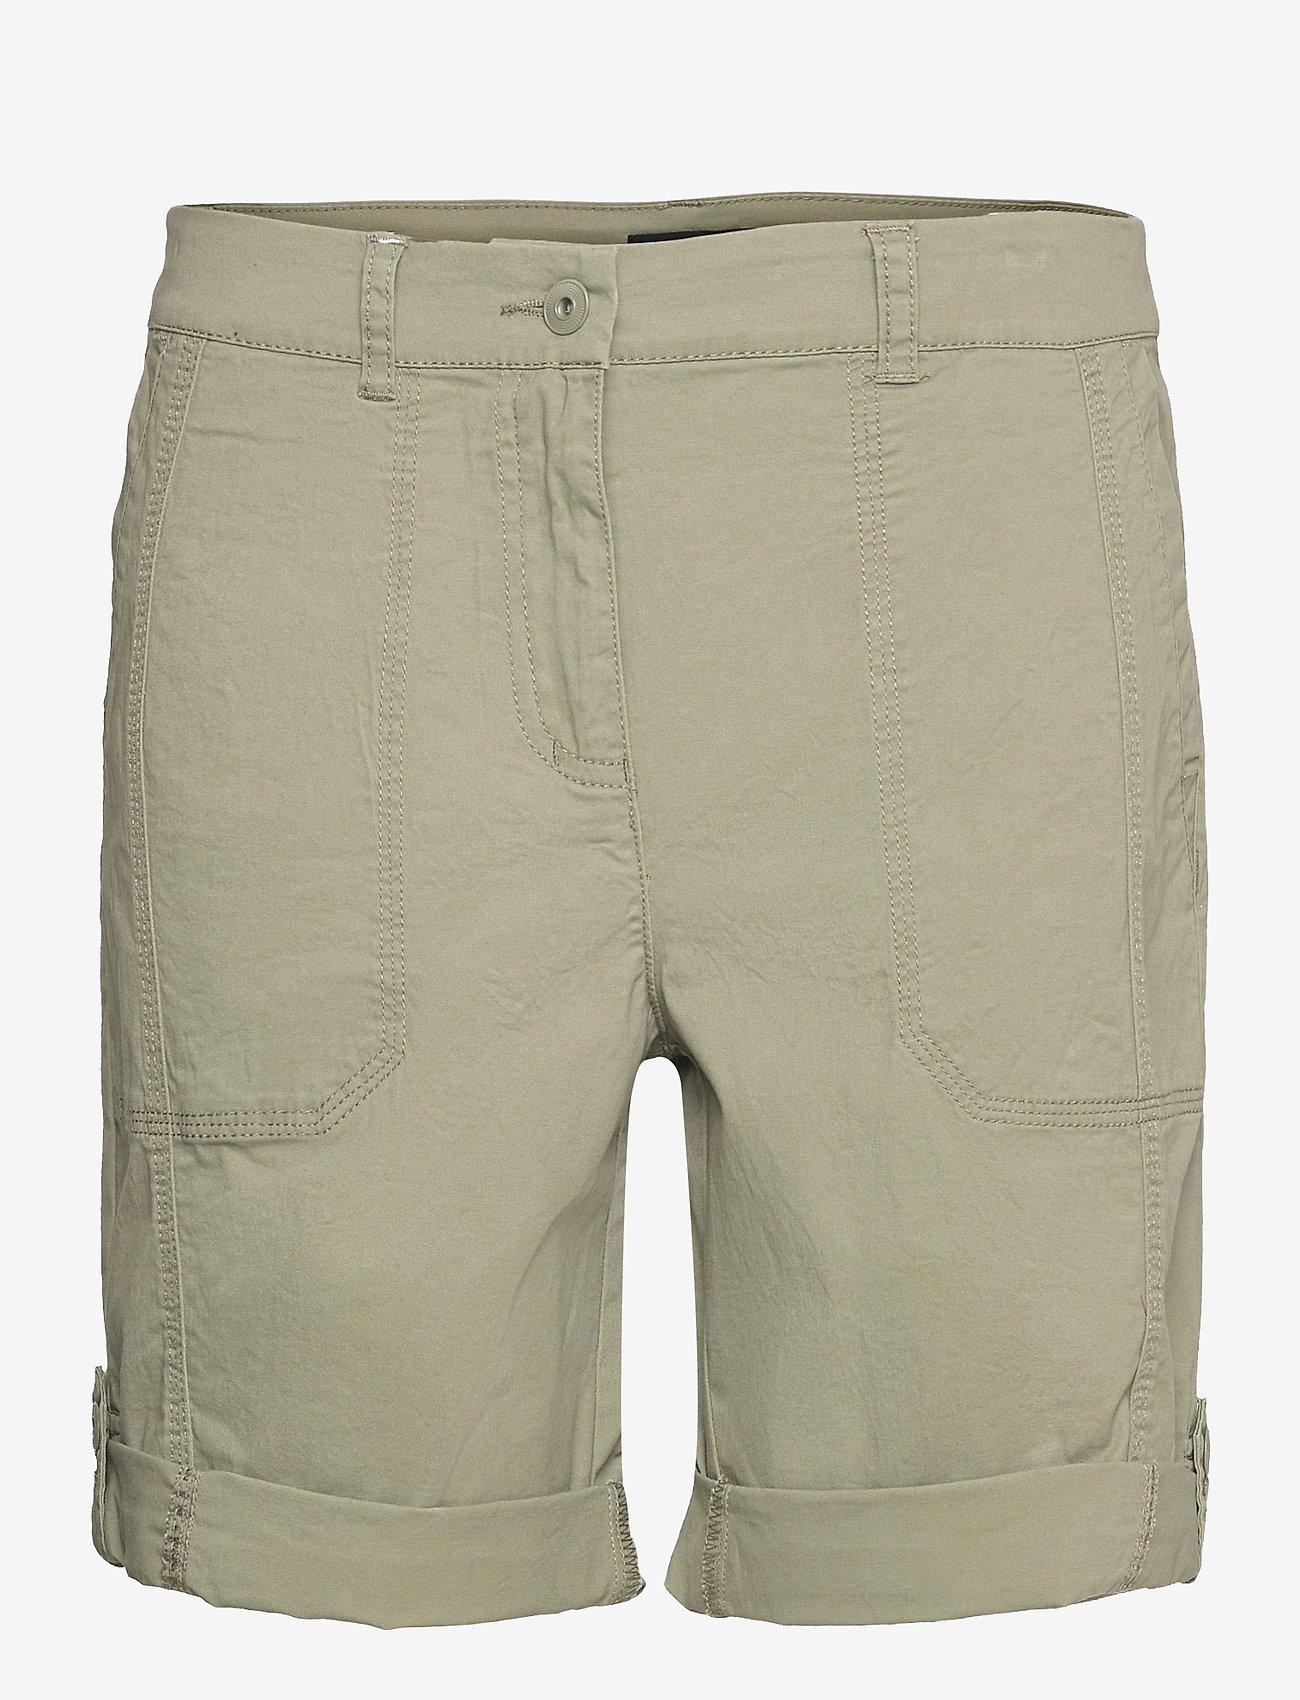 Brandtex - Casual shorts - shorts casual - deep lichen green - 1